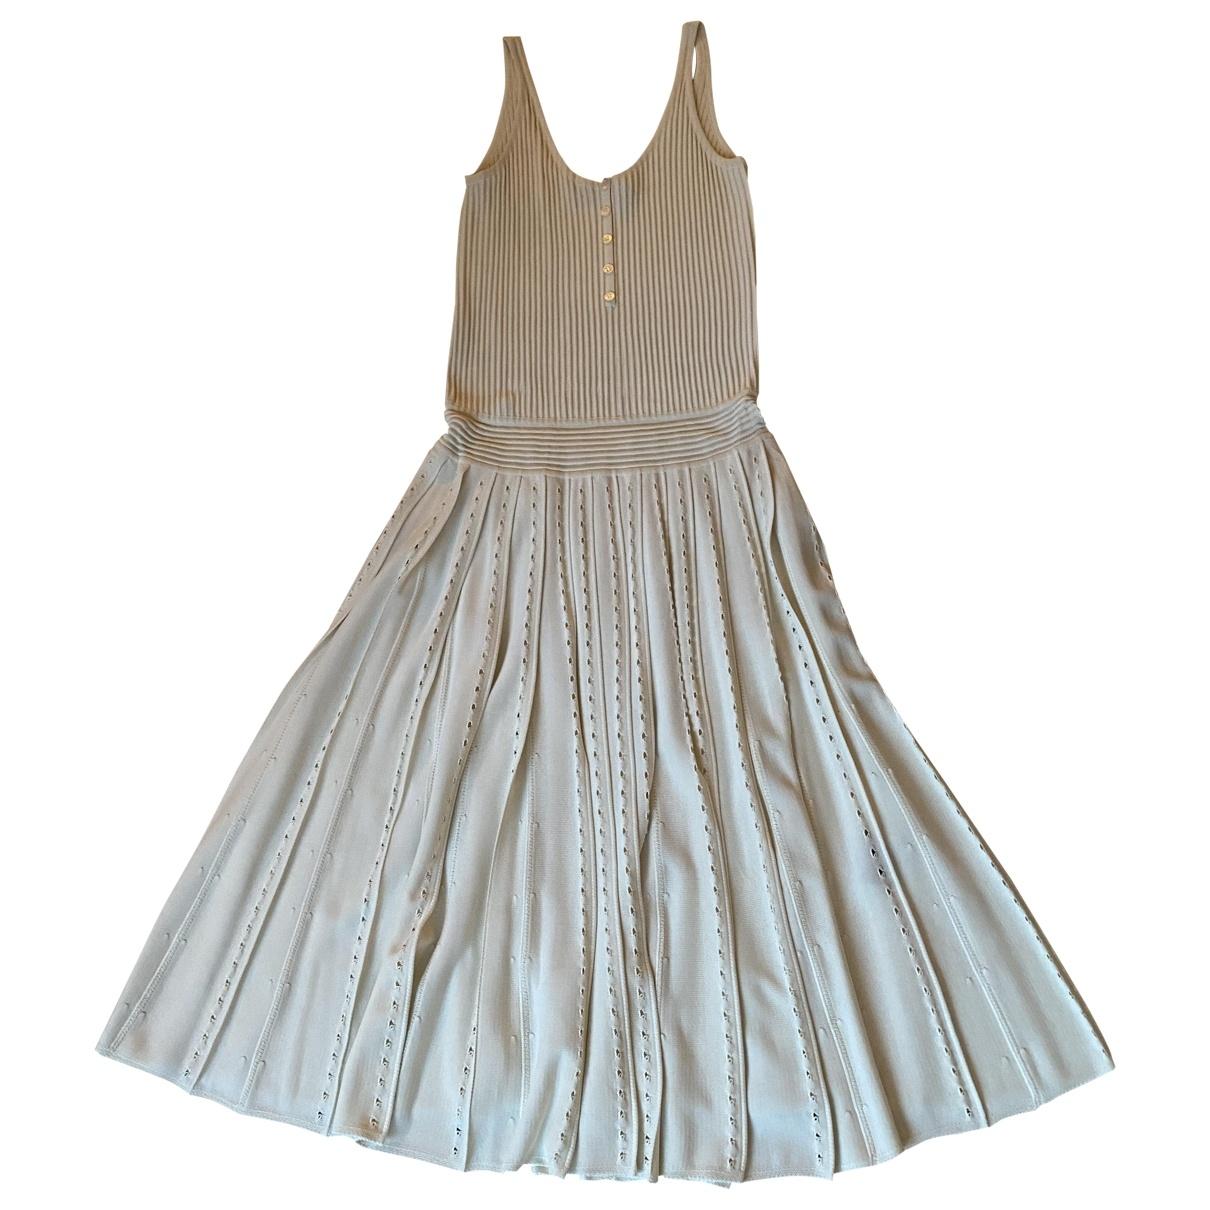 Salvatore Ferragamo \N Kleid in  Beige Viskose